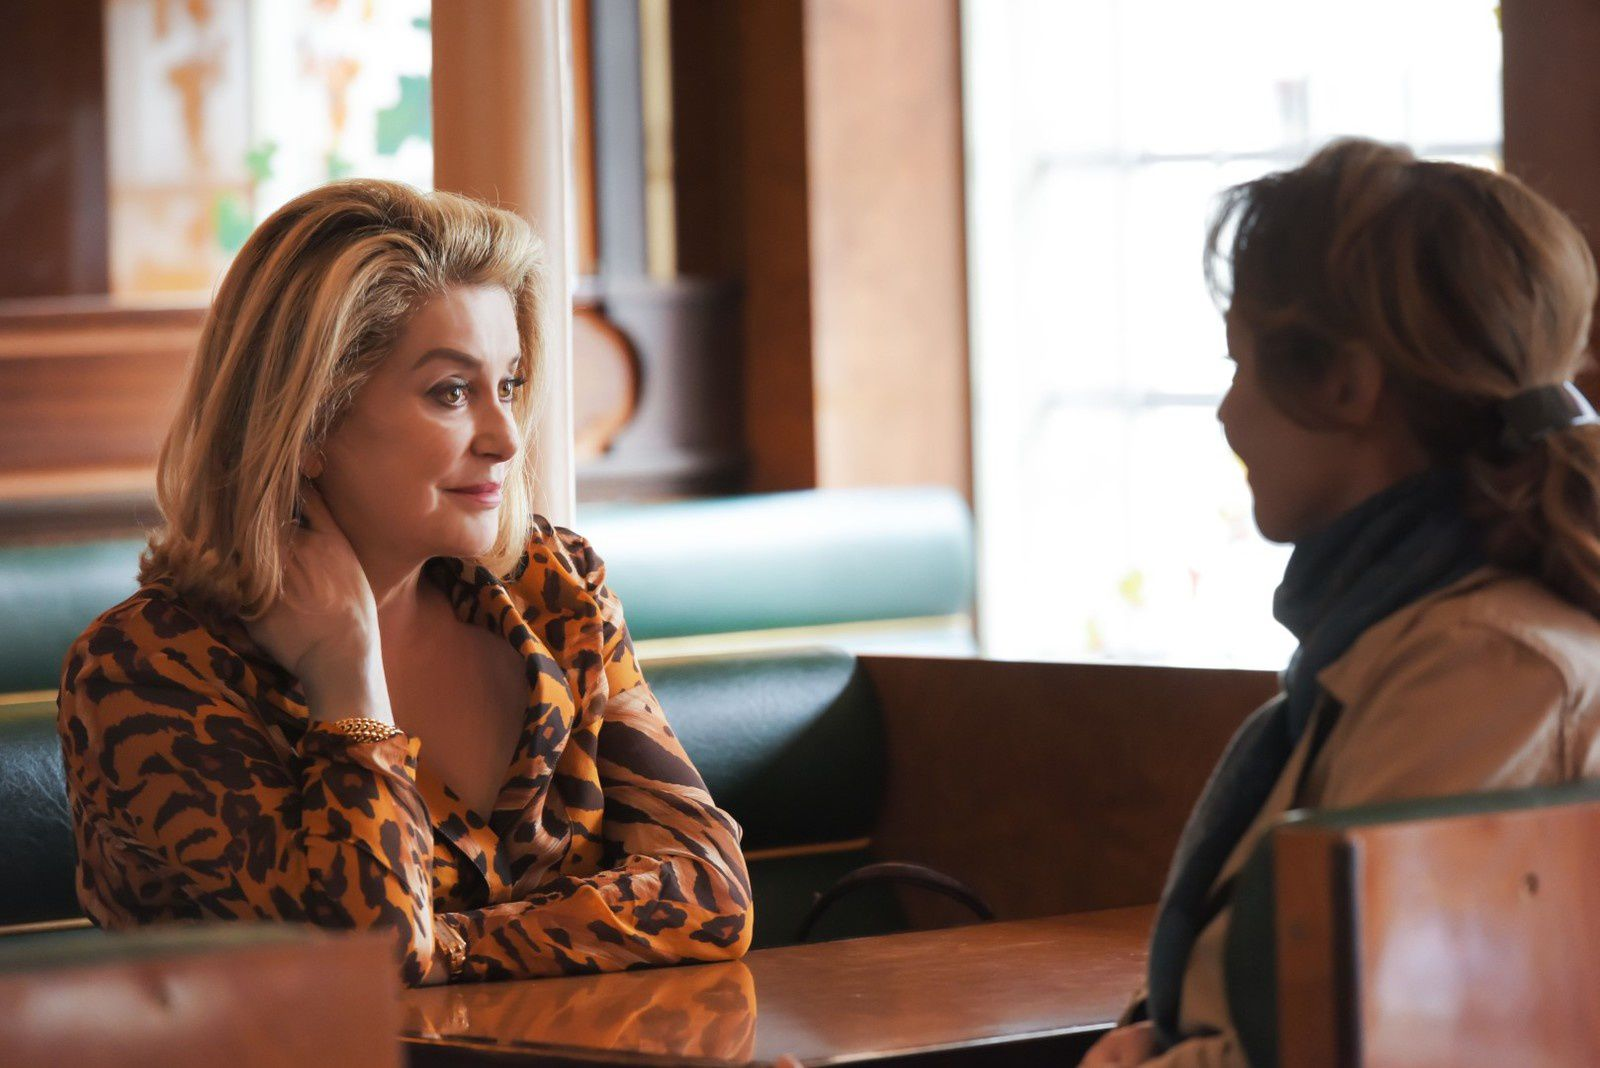 Sage Femme (BANDE ANNONCE) avec Catherine Deneuve, Catherine Frot, Olivier Gourmet - Le 22 mars 2017 au cinéma